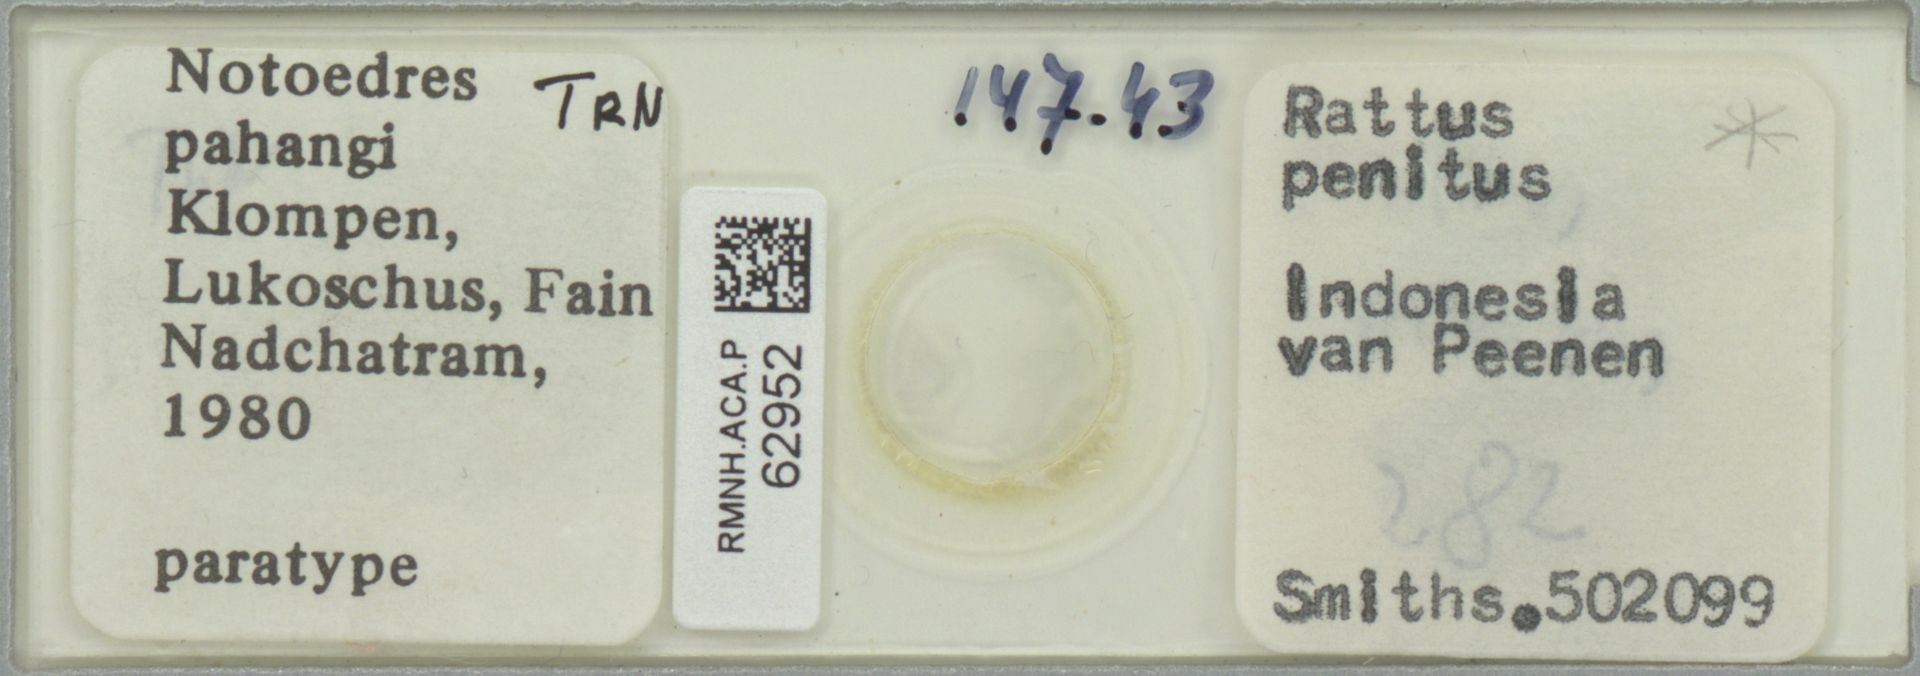 RMNH.ACA.P.62952 | Notoedres pahangi Klompen, Lukoschus, Fain Nadchatram, 1980